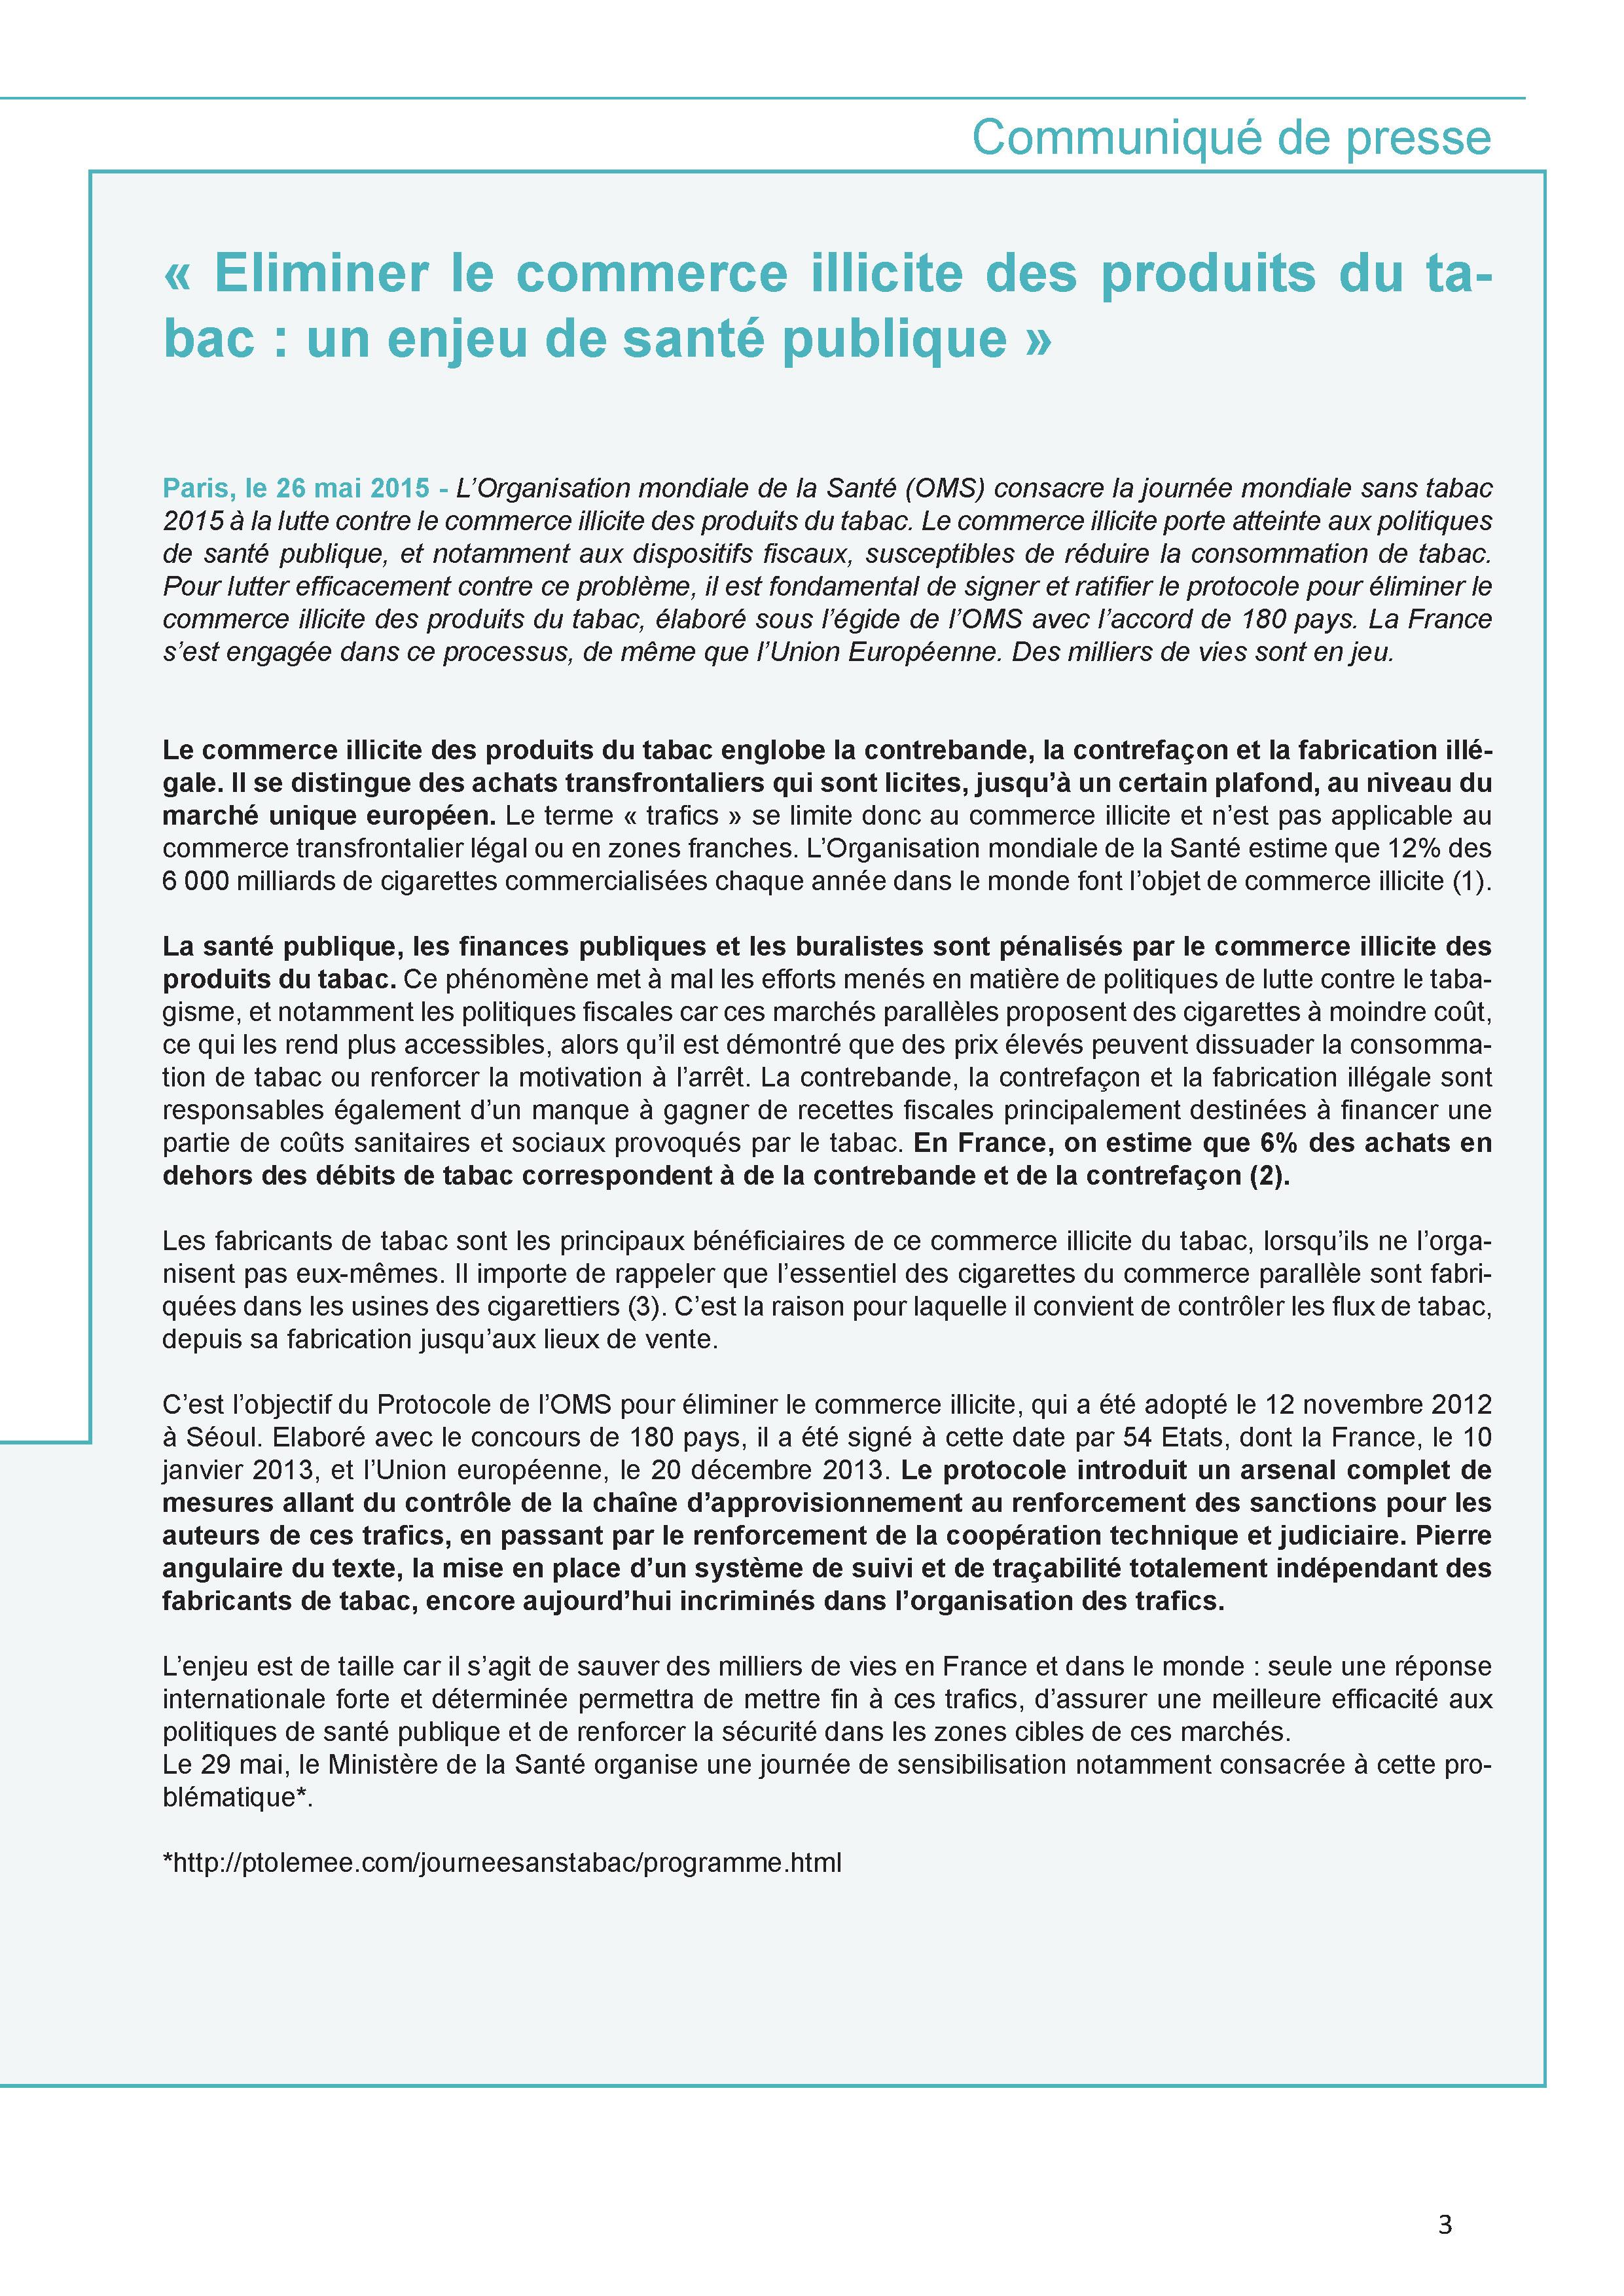 Alliance-DP_commerce-illicite-26mai2015_Page_03.jpg